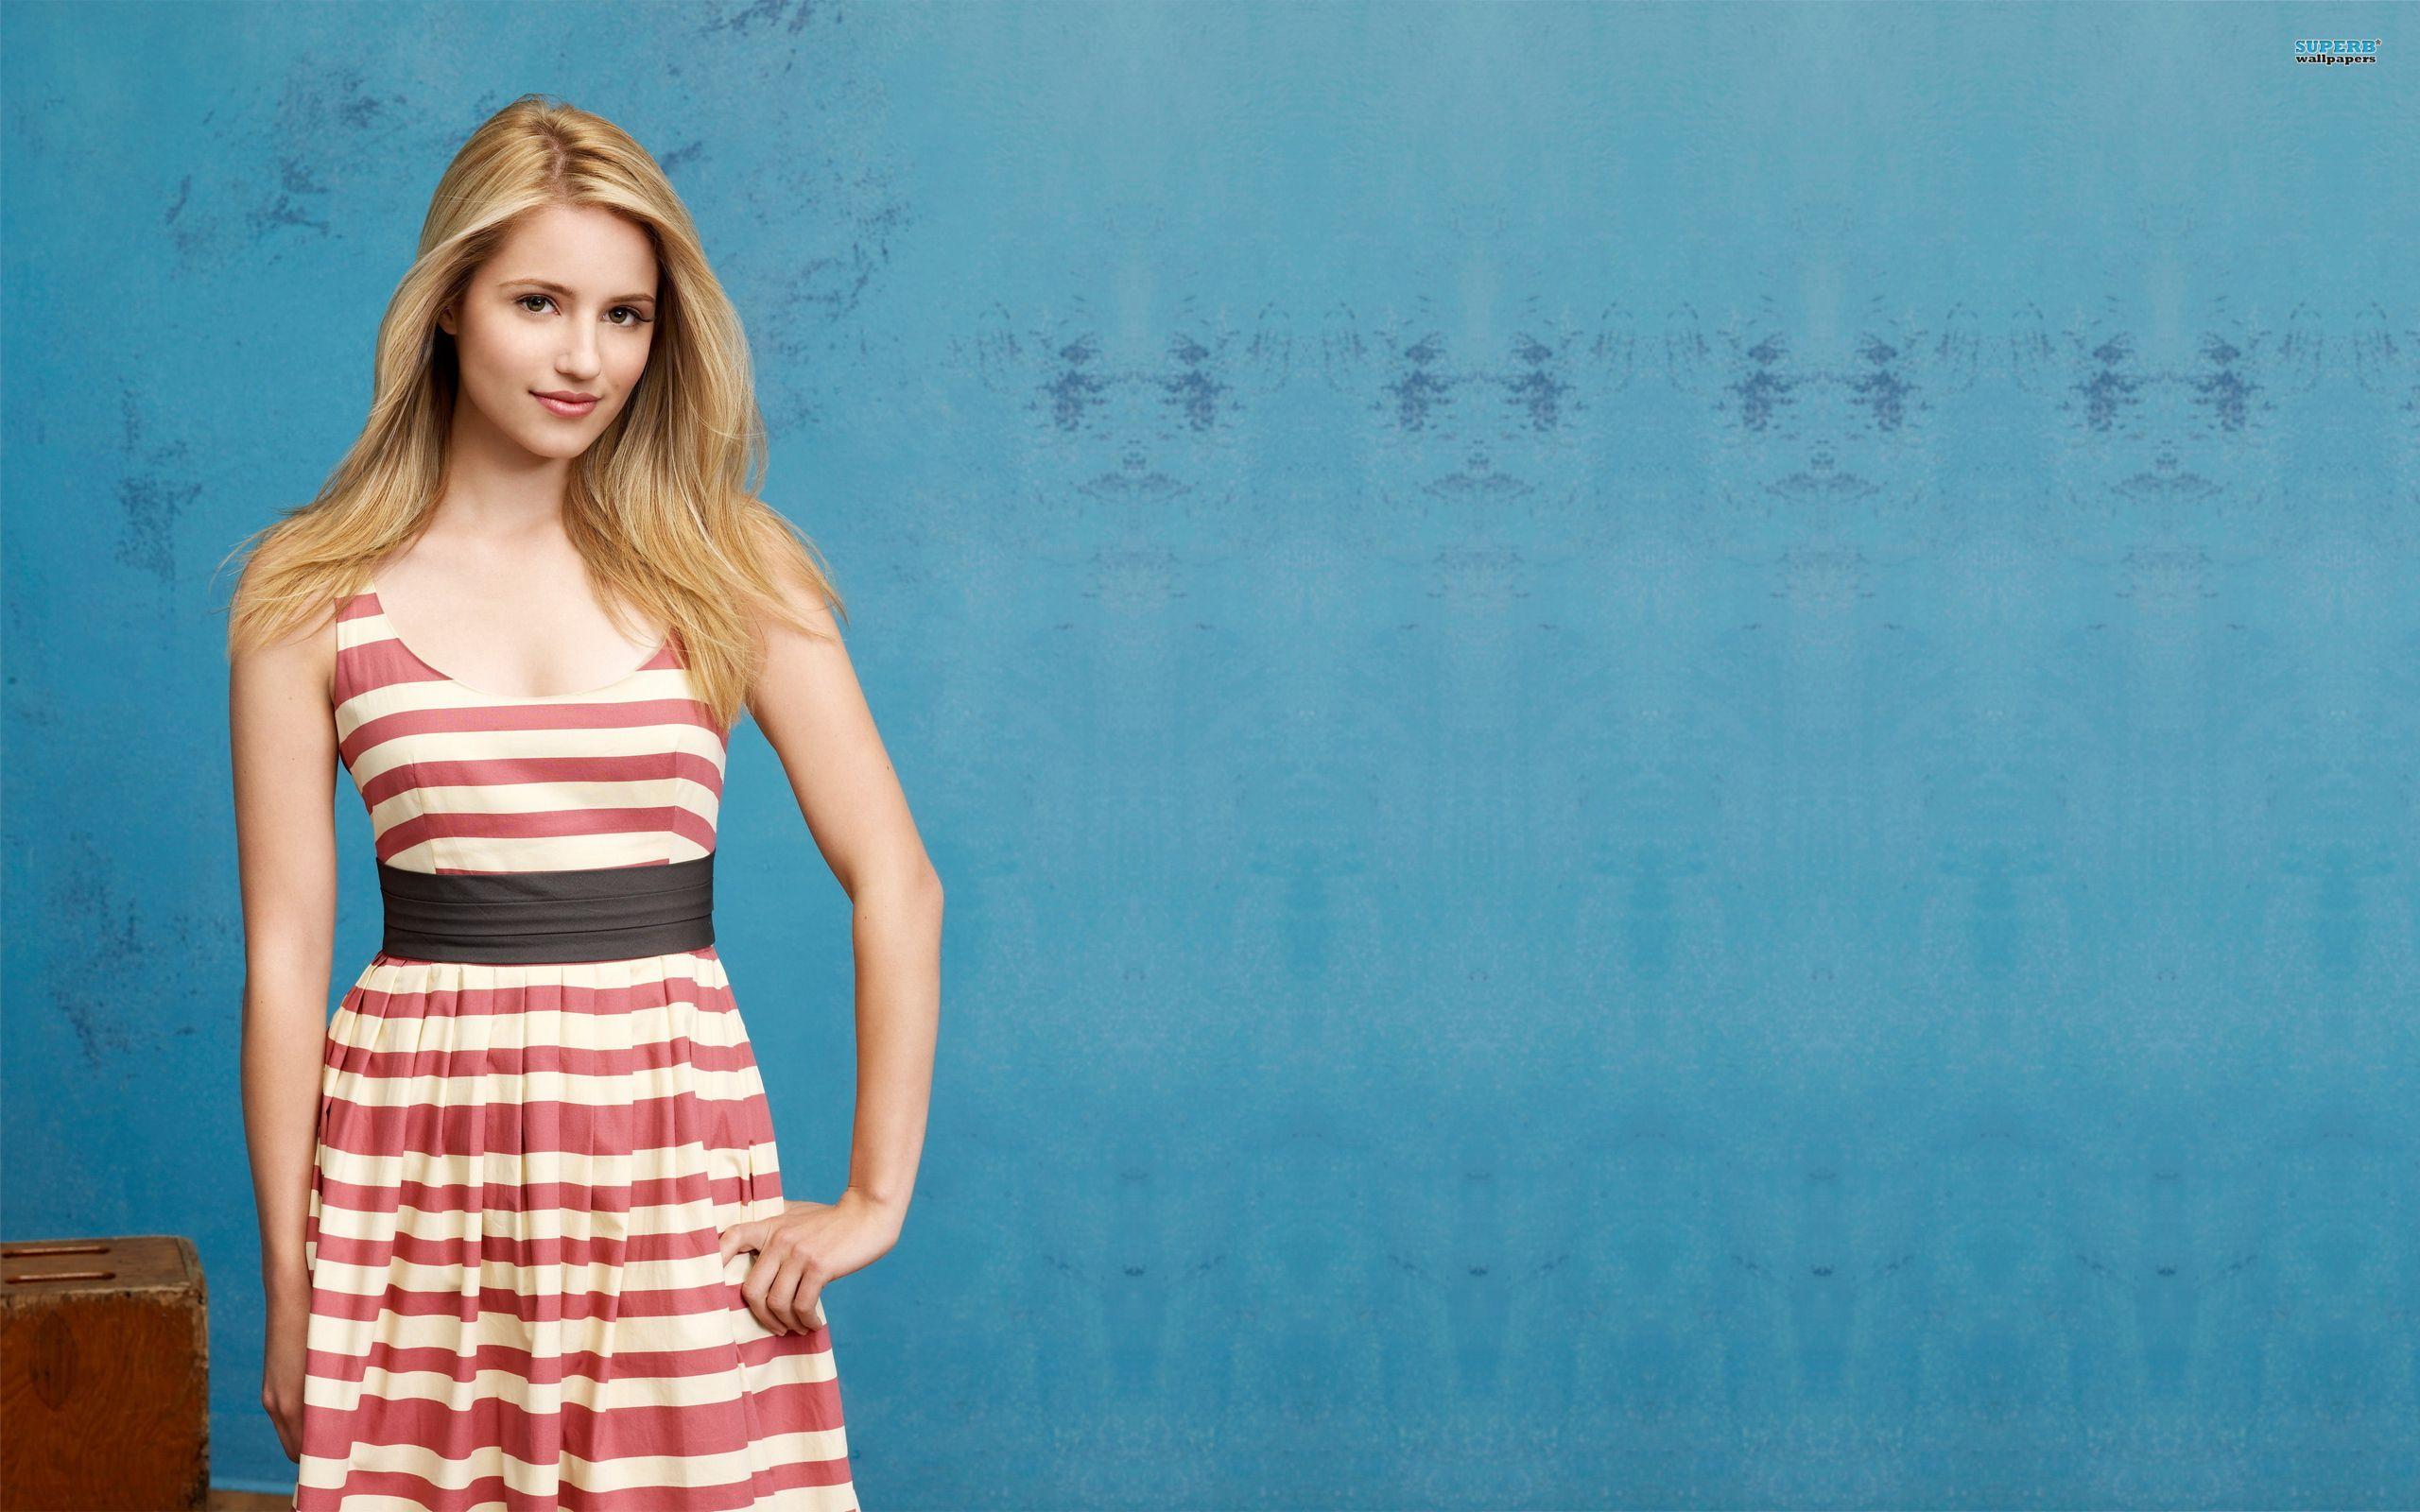 Glee Dianna Agron Wallpaper DRAGONater wallpapers